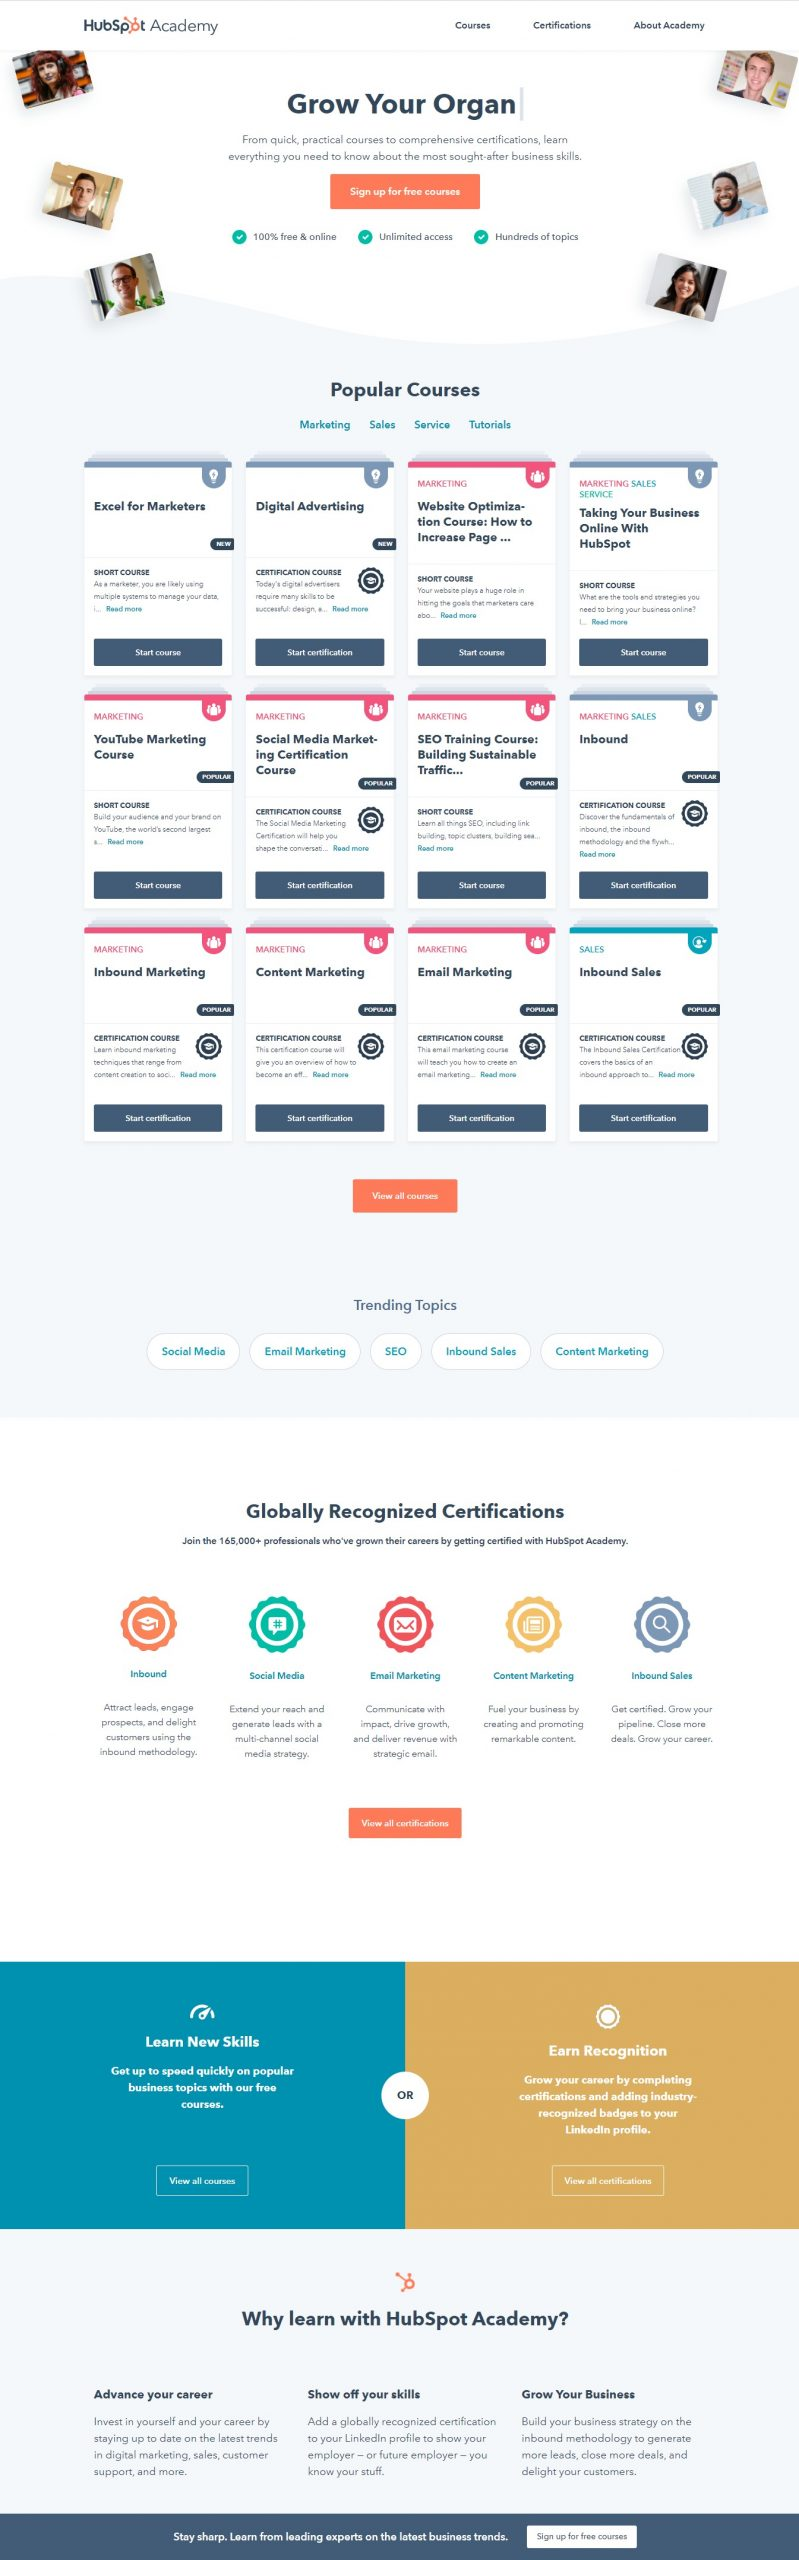 HubSpot Online Marketing Courses